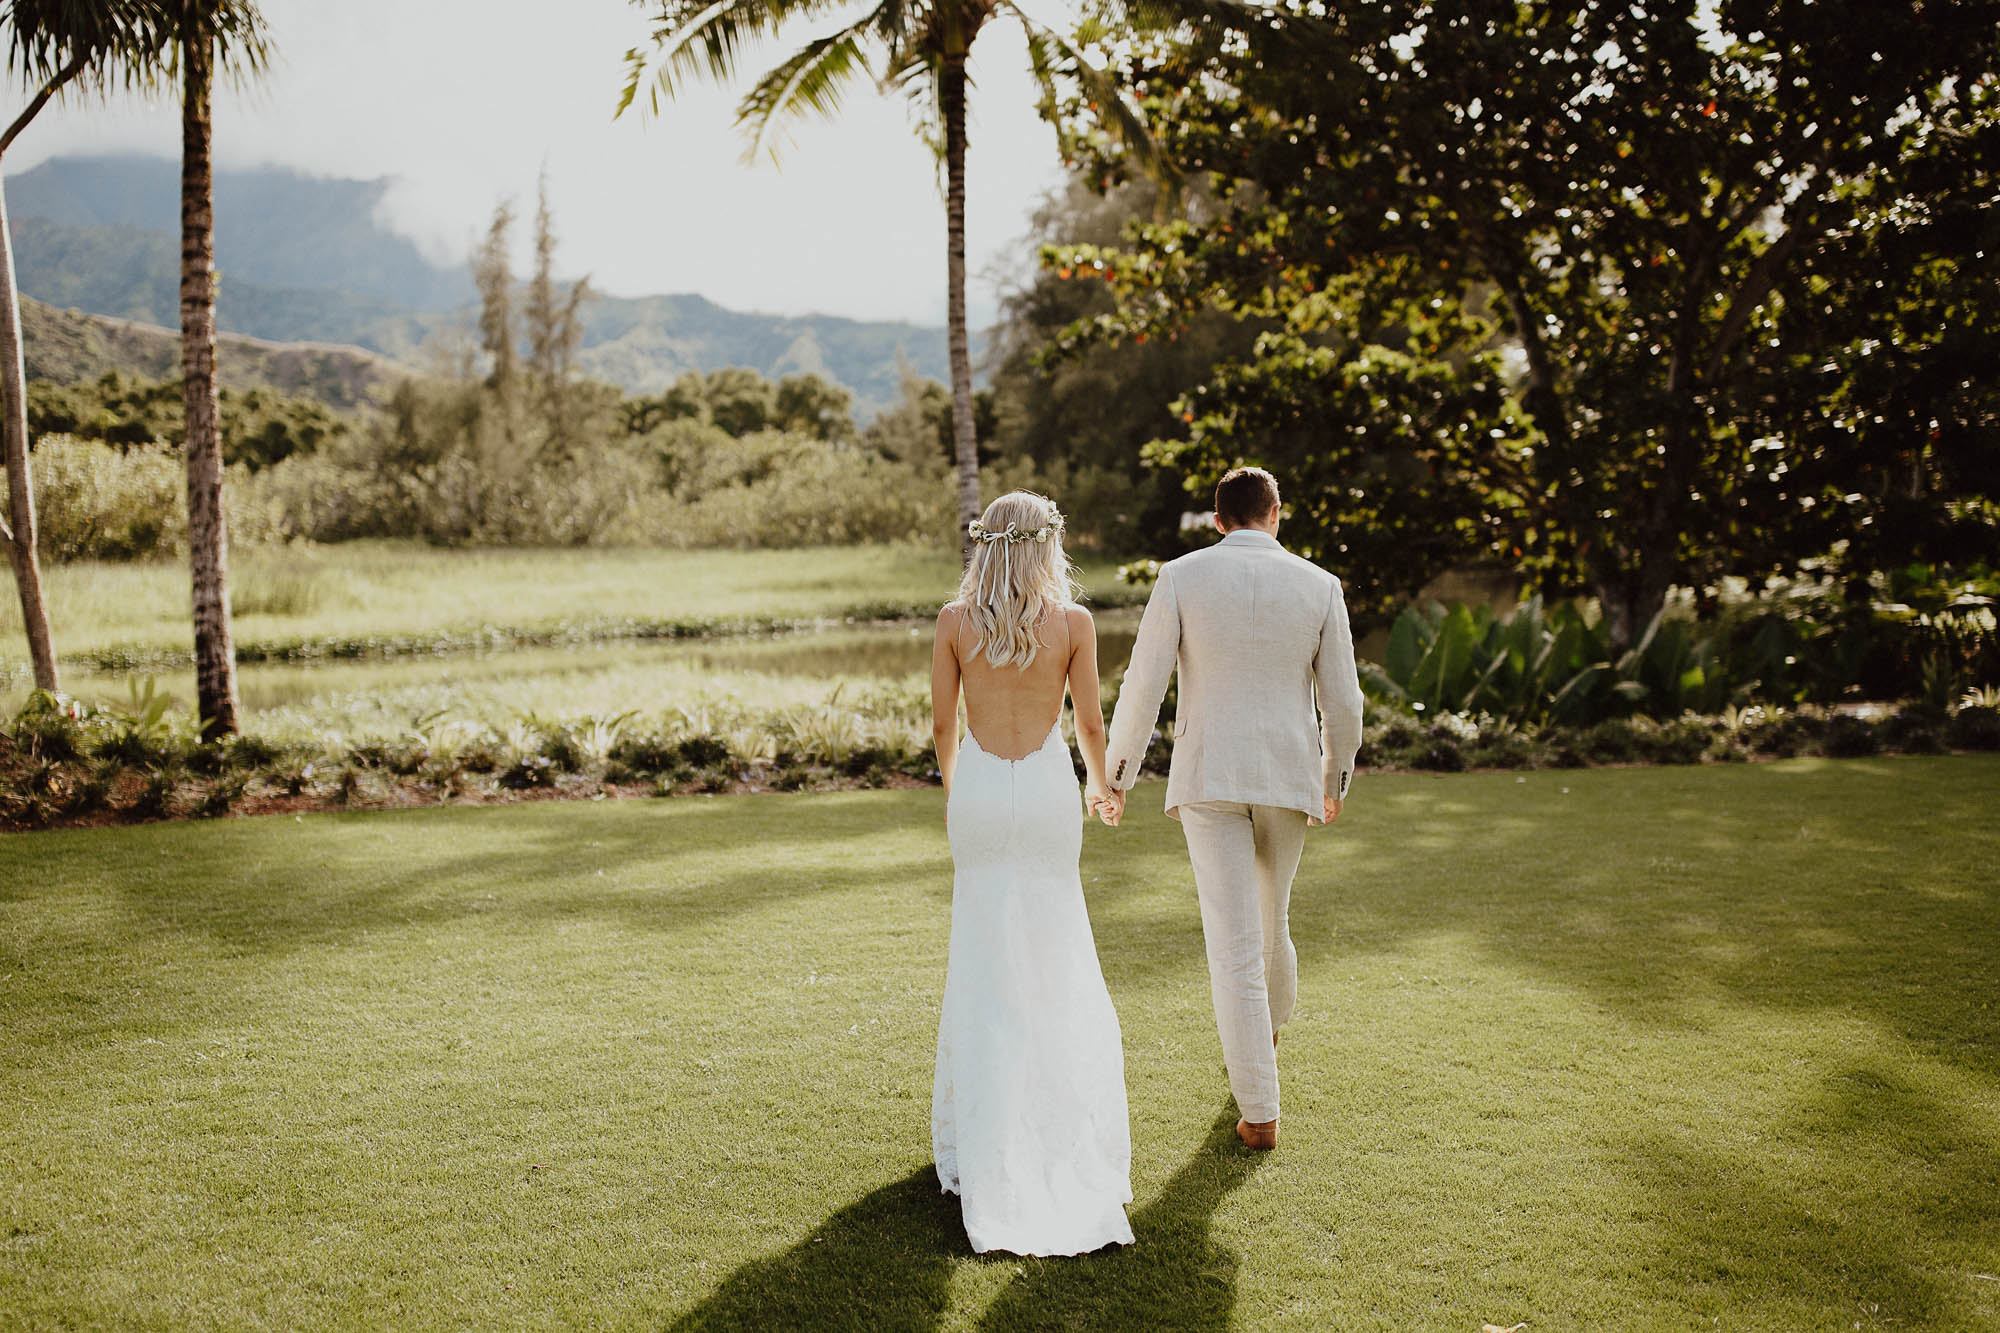 Couple photos backless wedding dress on hanalei north shore kauai hawaii